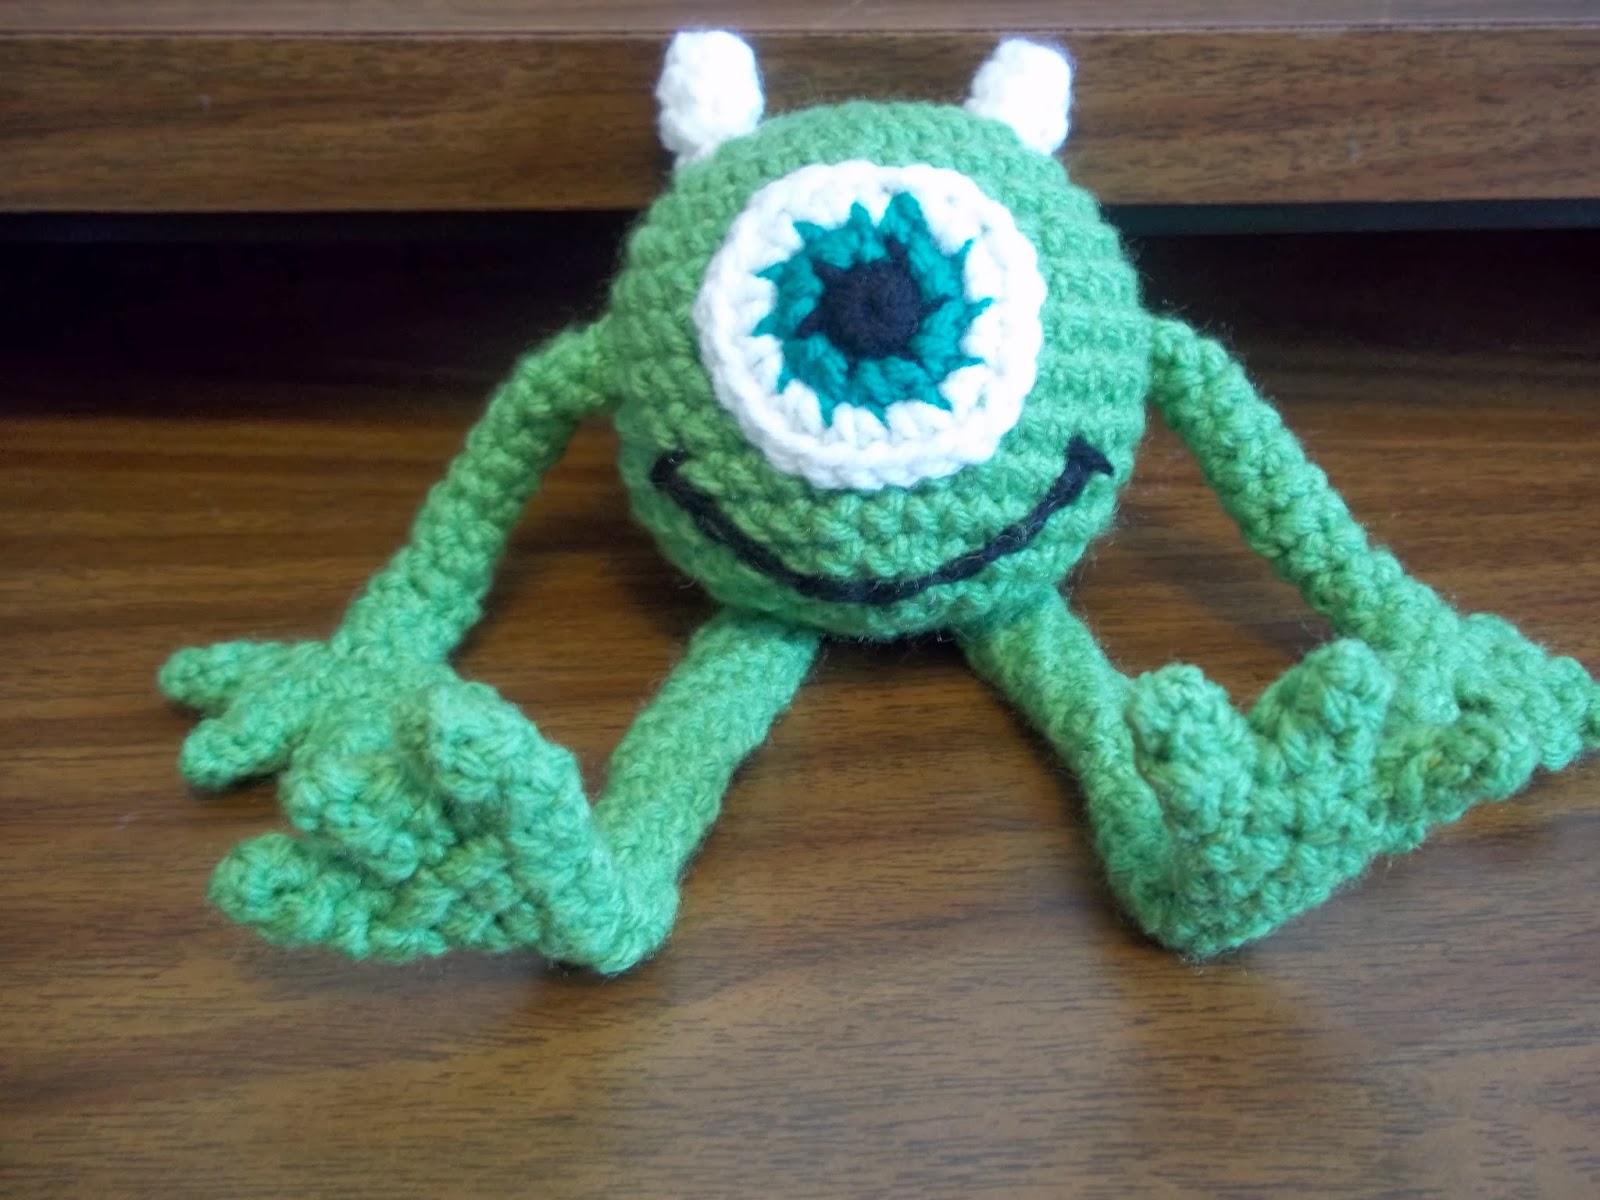 Amigurumi Monster Crochet : Eden is only a dream away: Crochet Monster Amigurumi Number 2